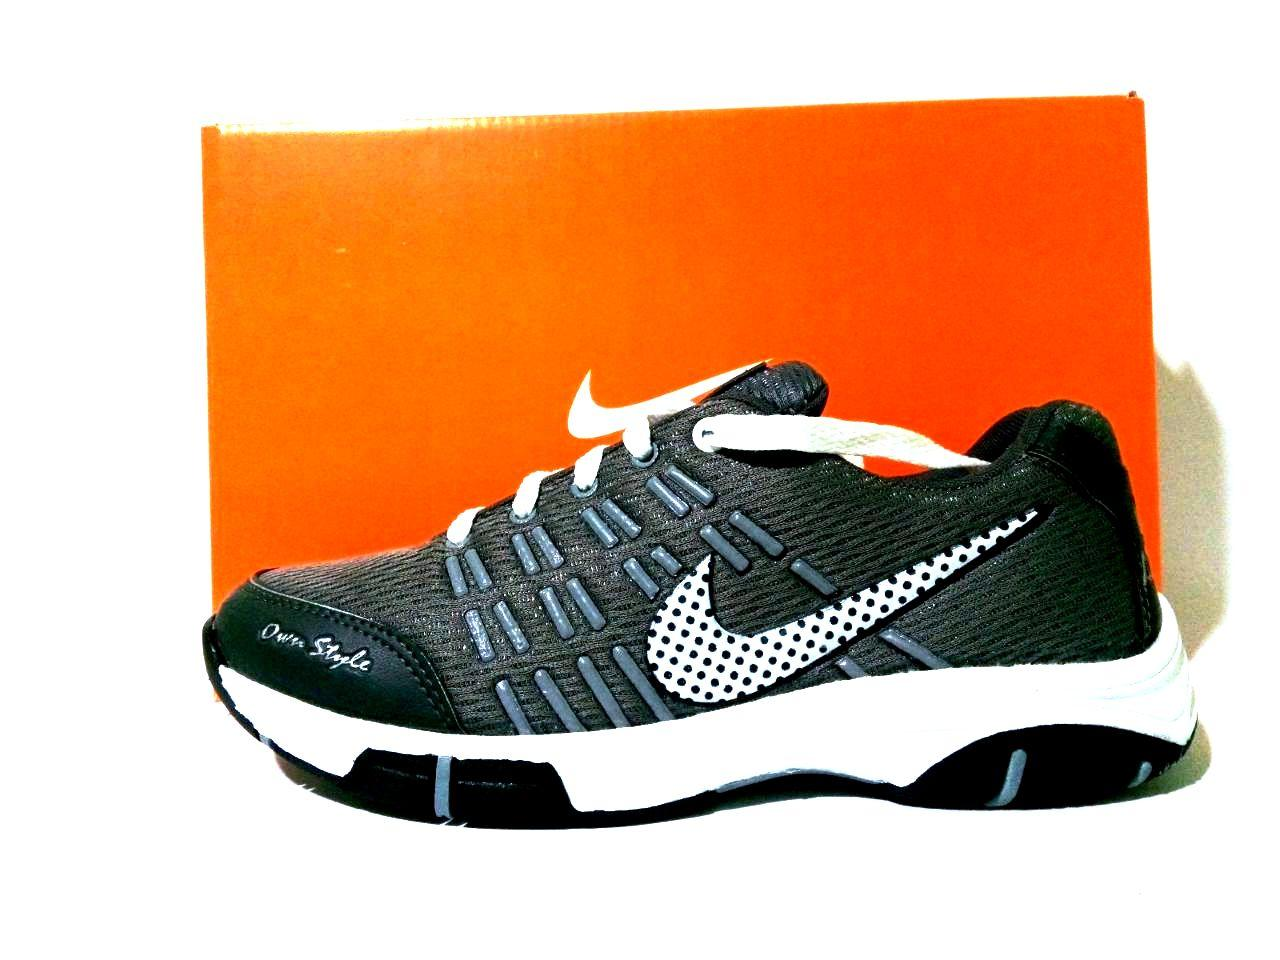 MahkotaFashion. Sepatu Futsal Kwl Nike Air Max / Sepatu Olahraga / Sepatu Running Own Style